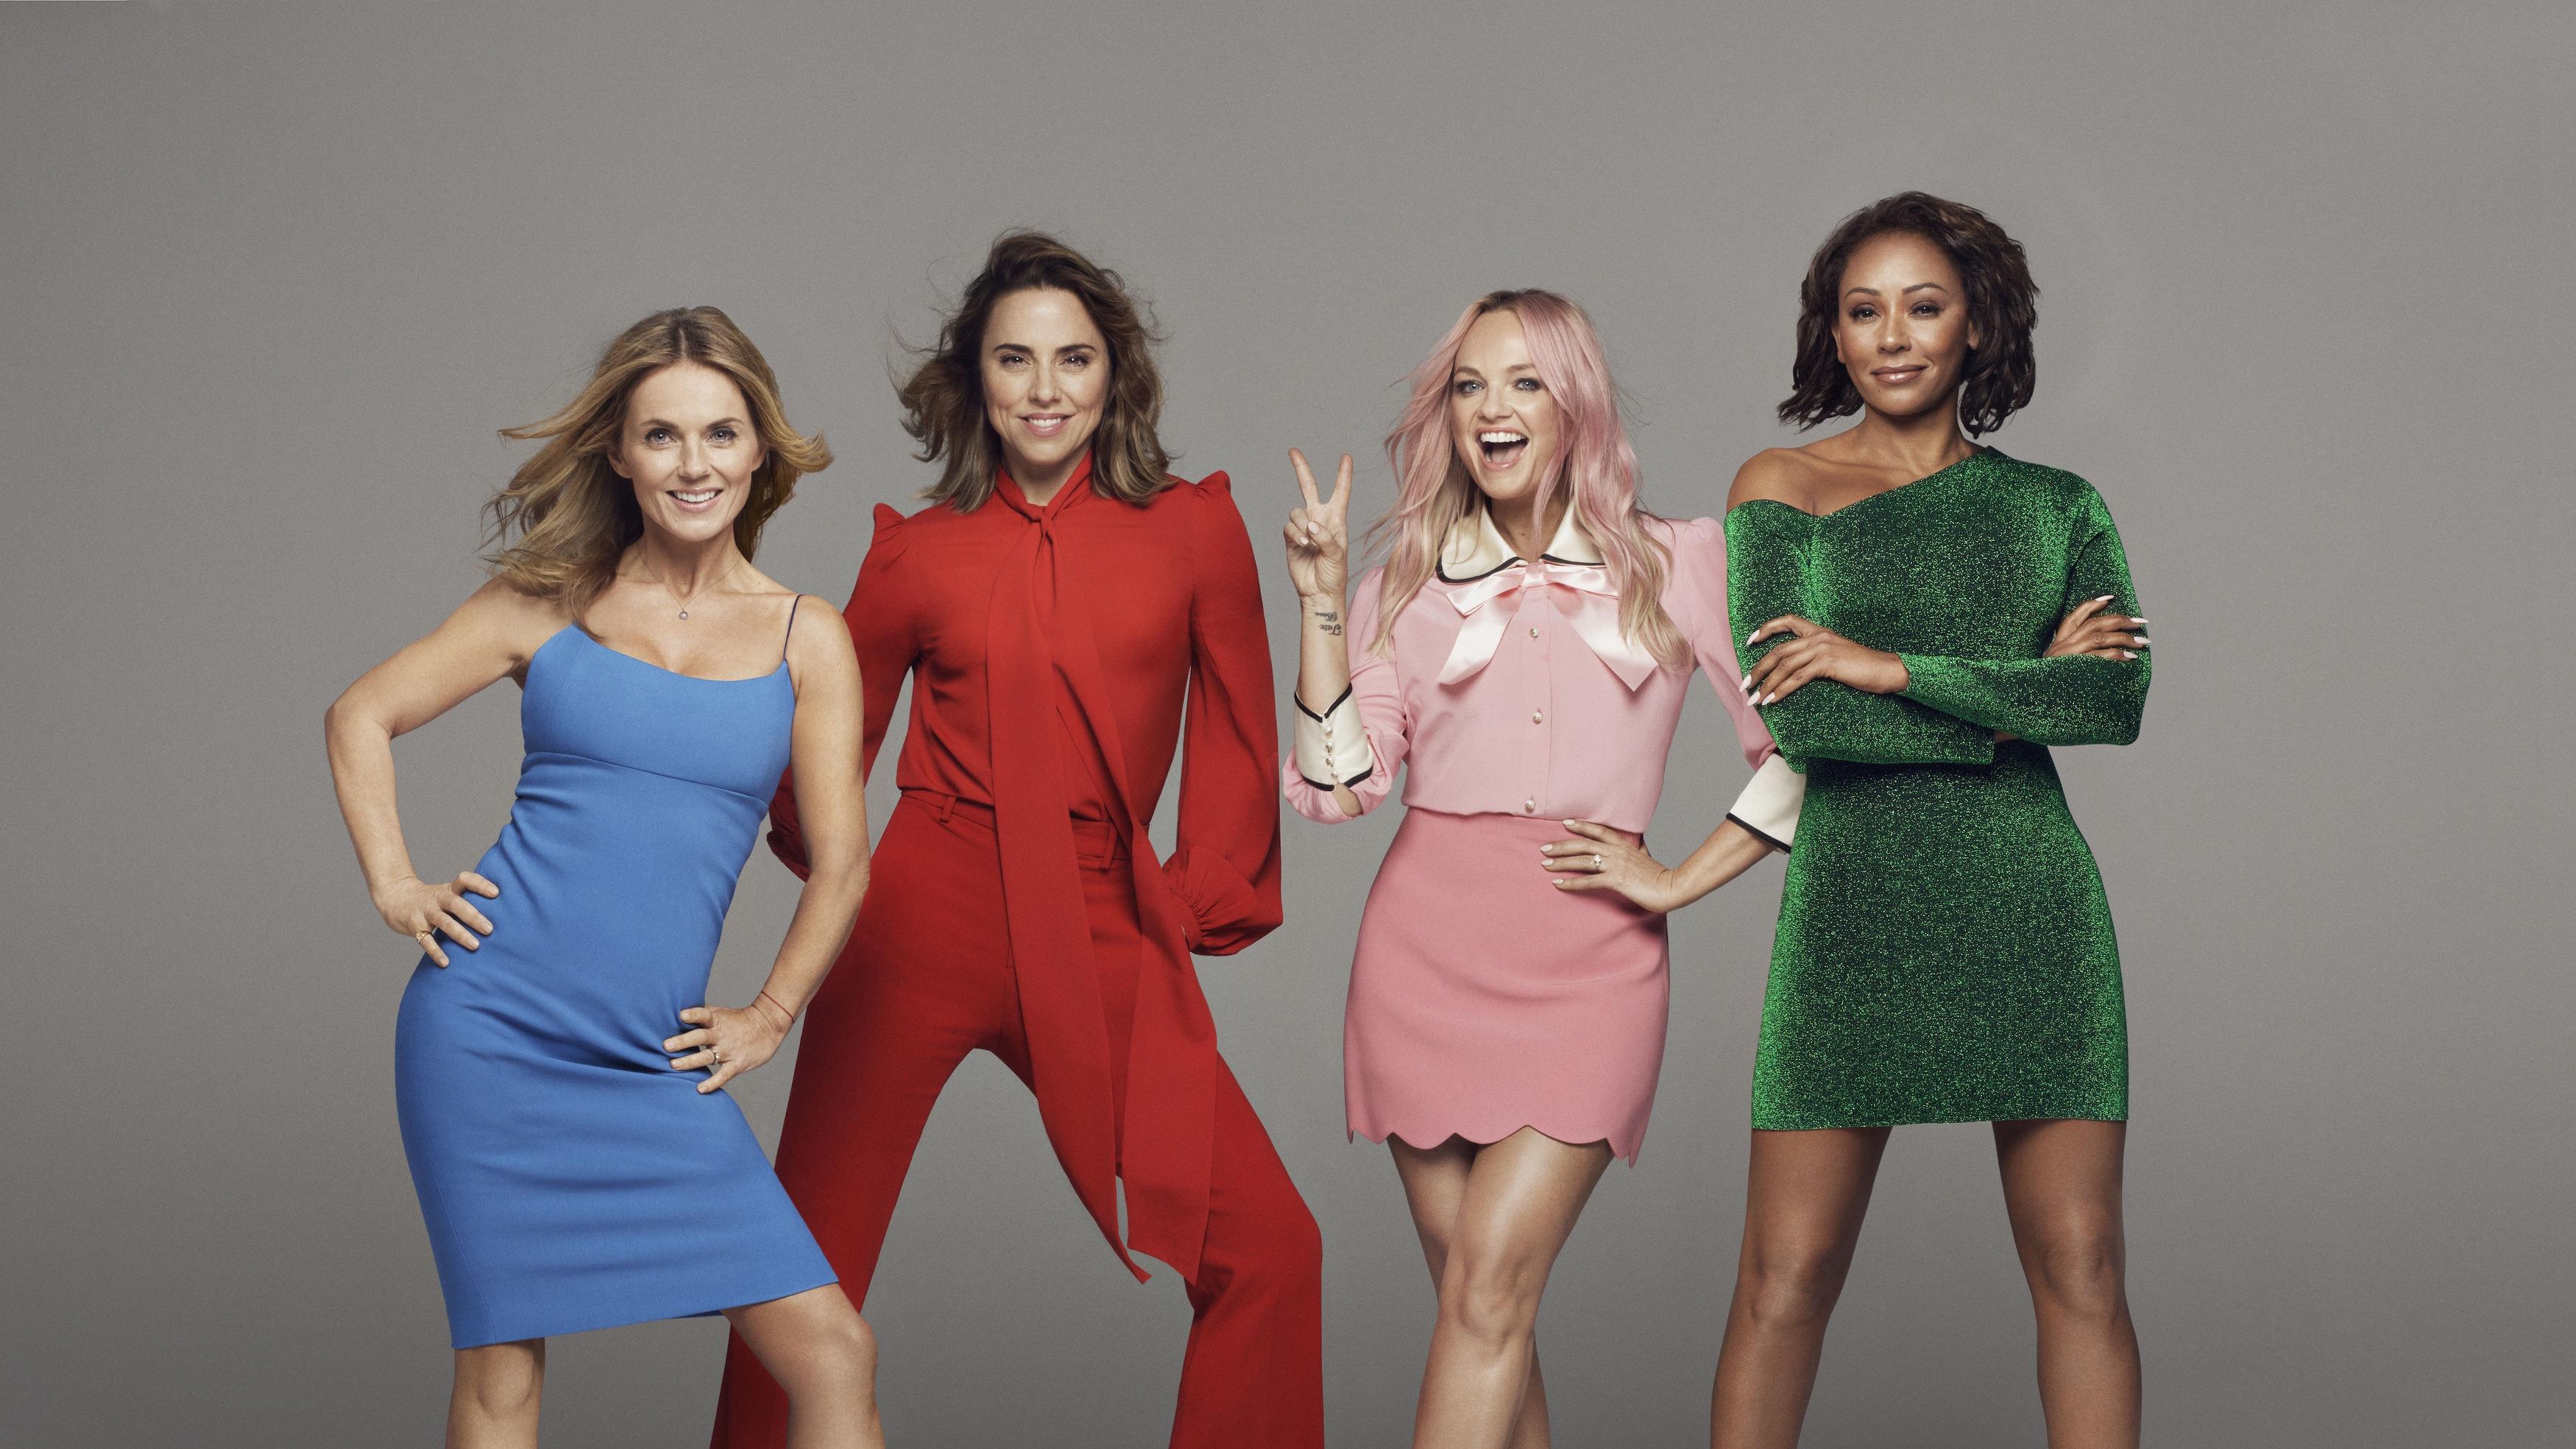 foto Spice Girls in L'Oreal talks